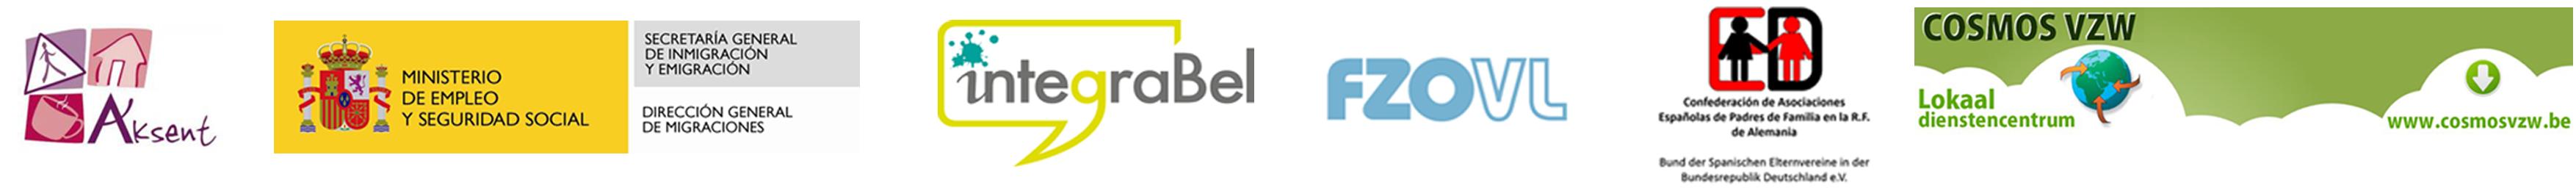 footer_logos